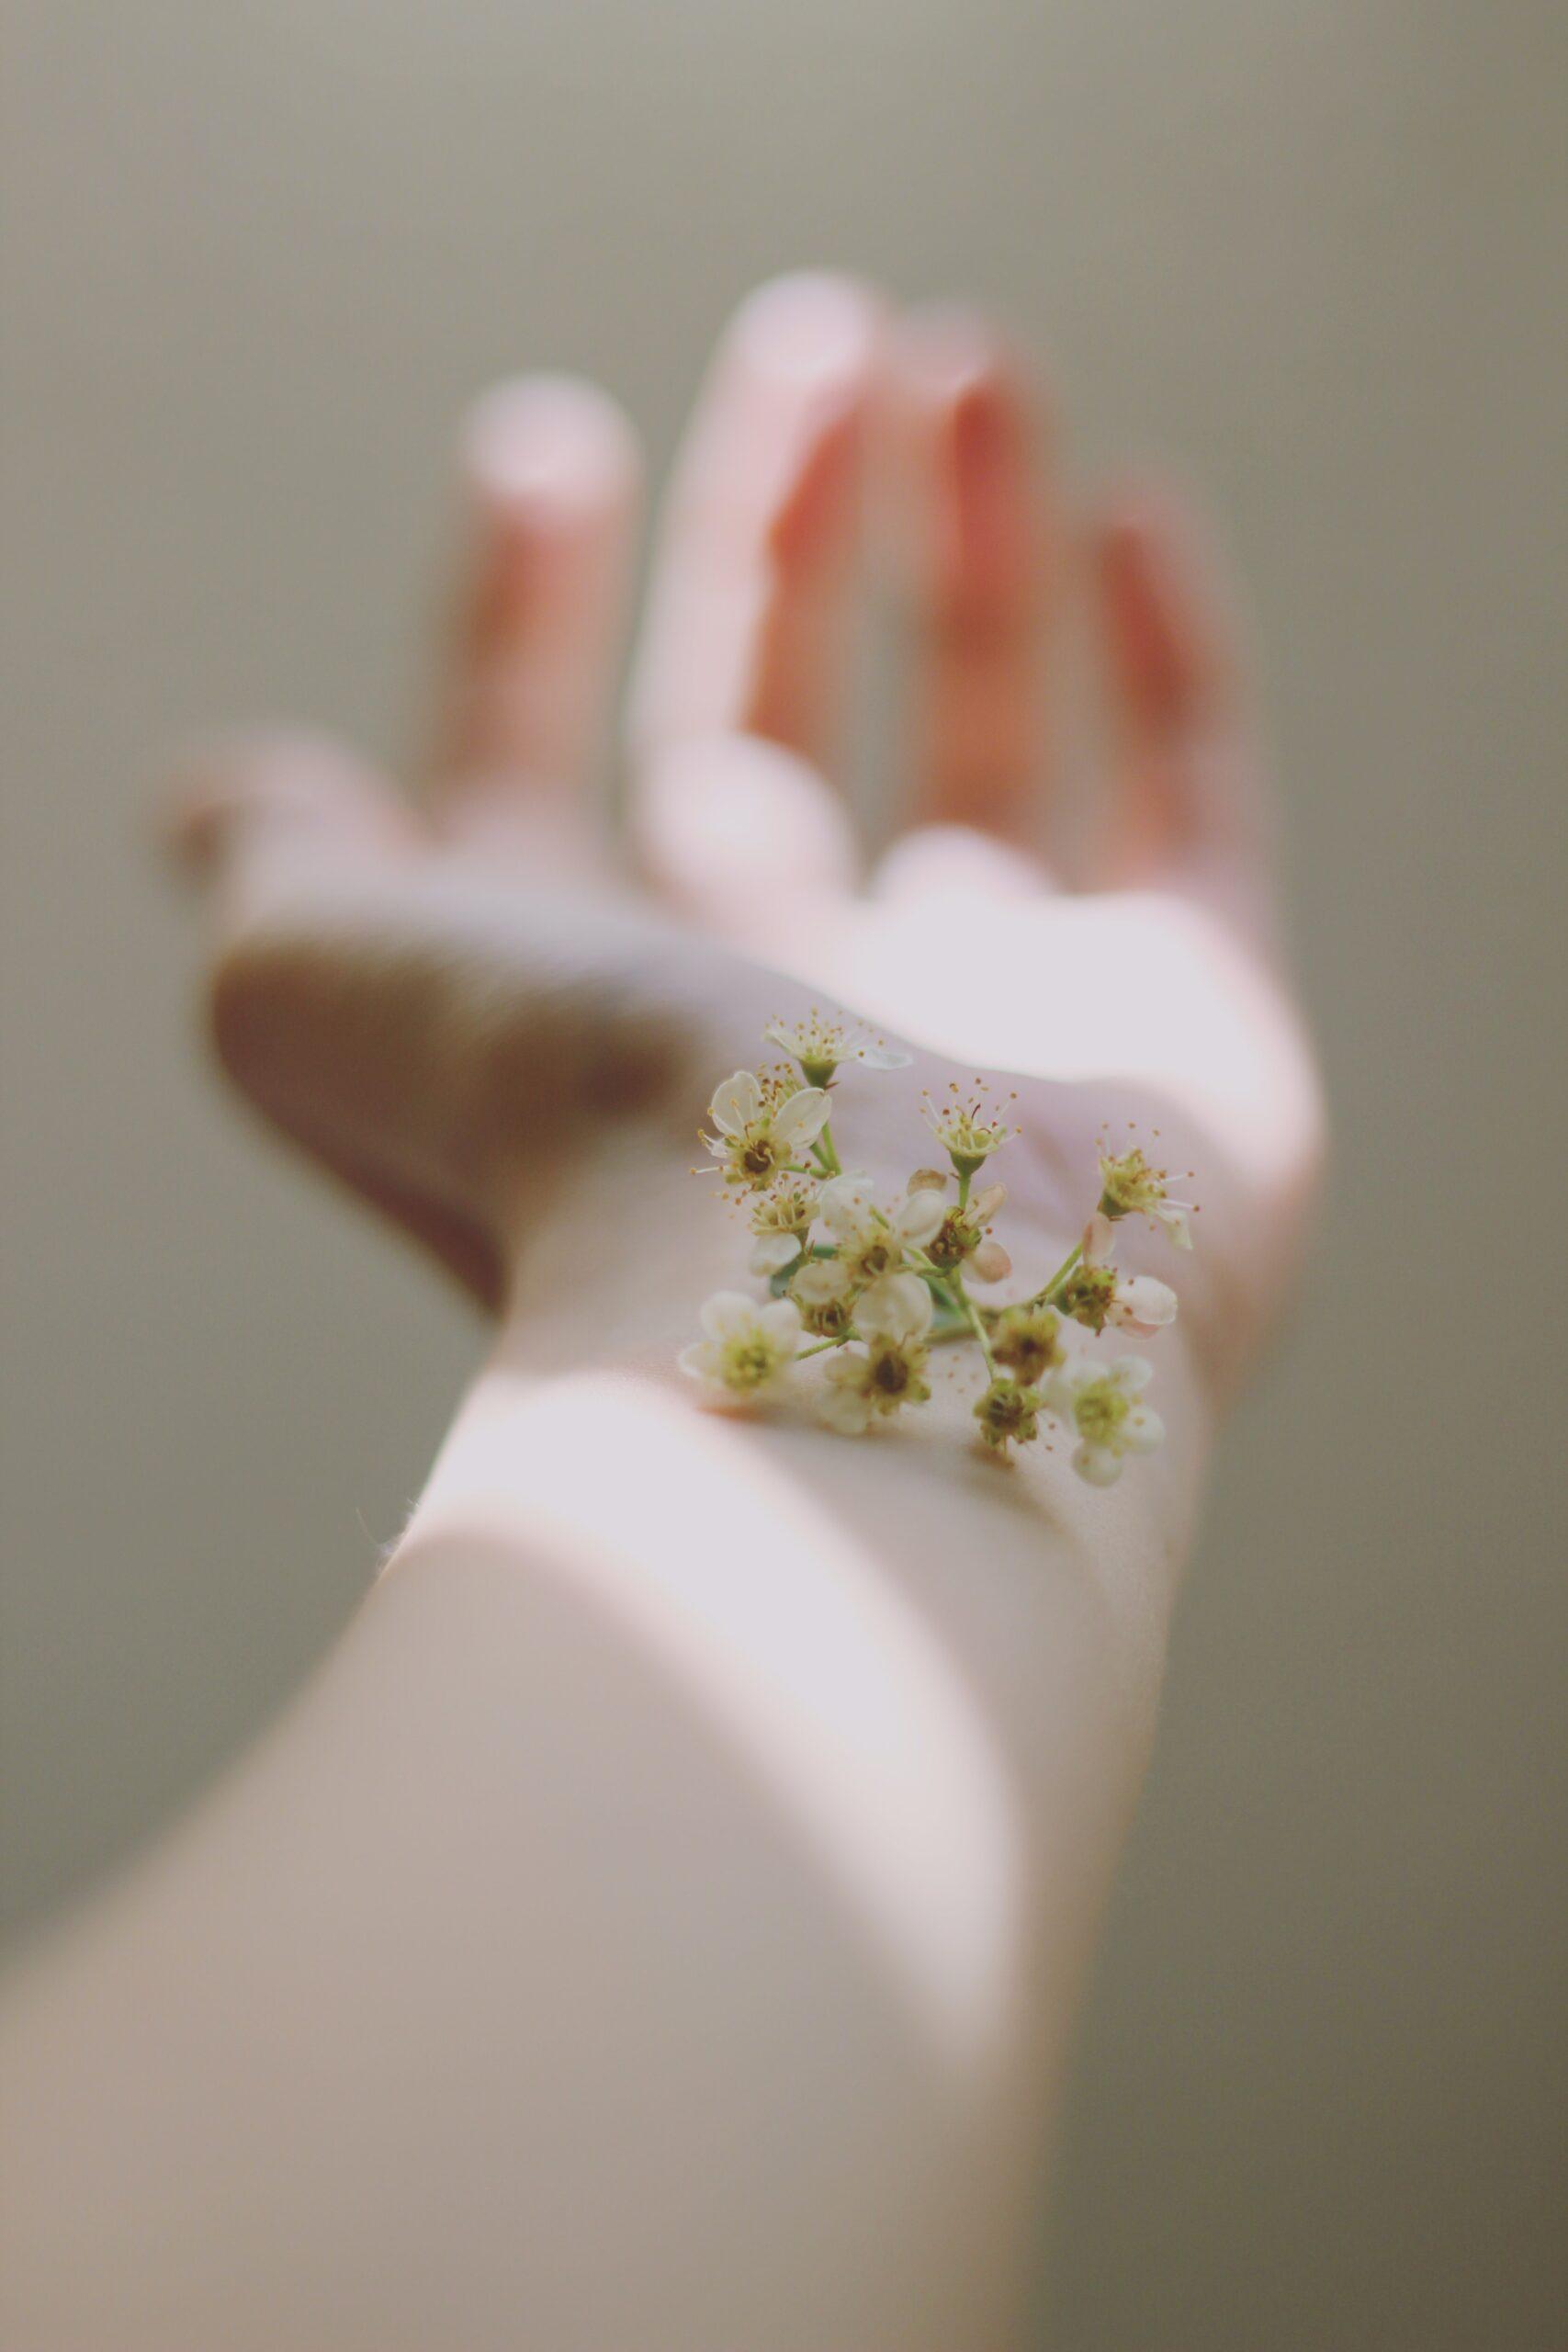 eczema stress and skin rashes